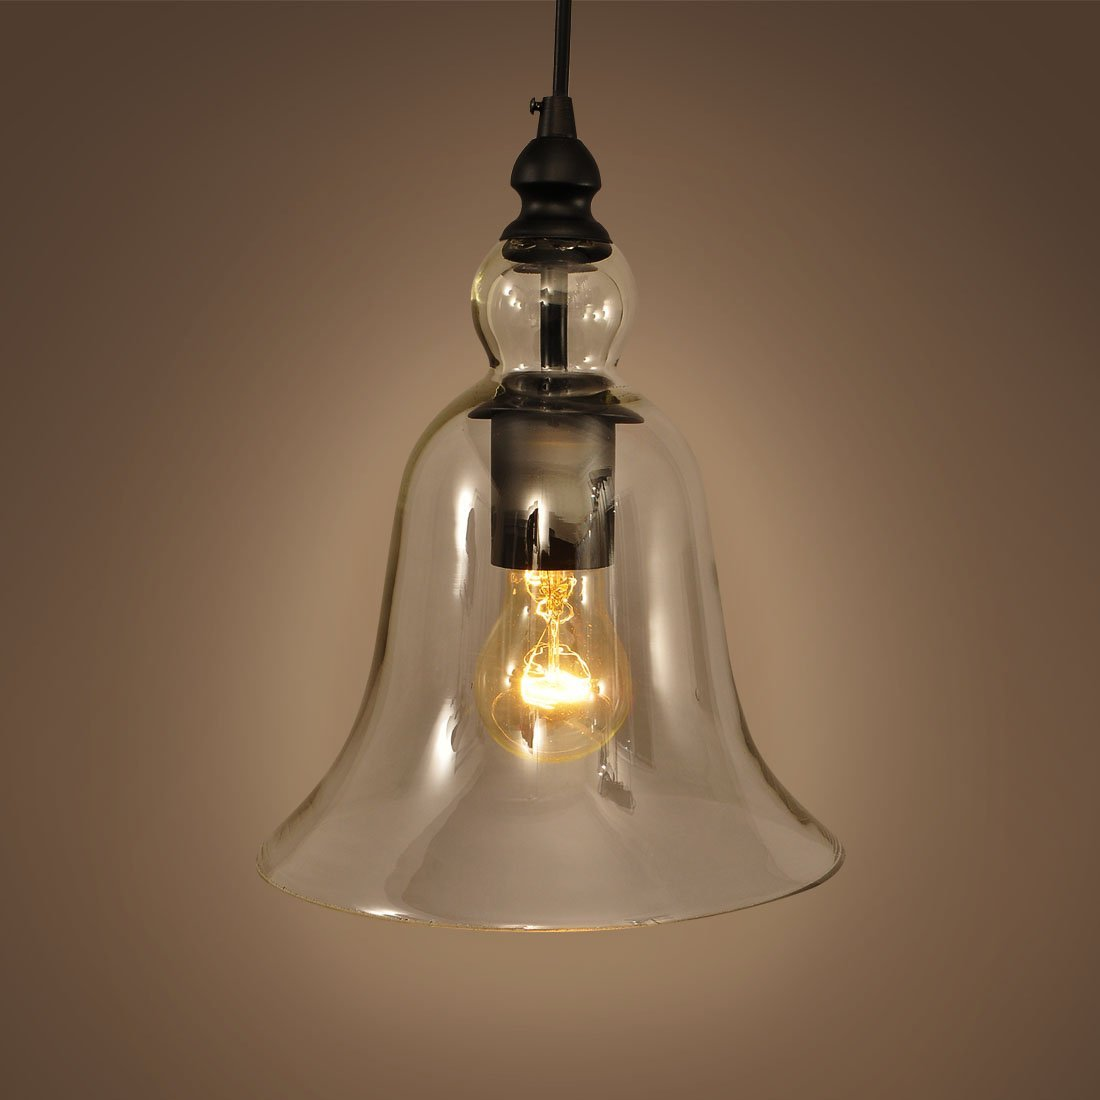 Industrial Bell Pendant Light: Linenandlavender.net: Lighting